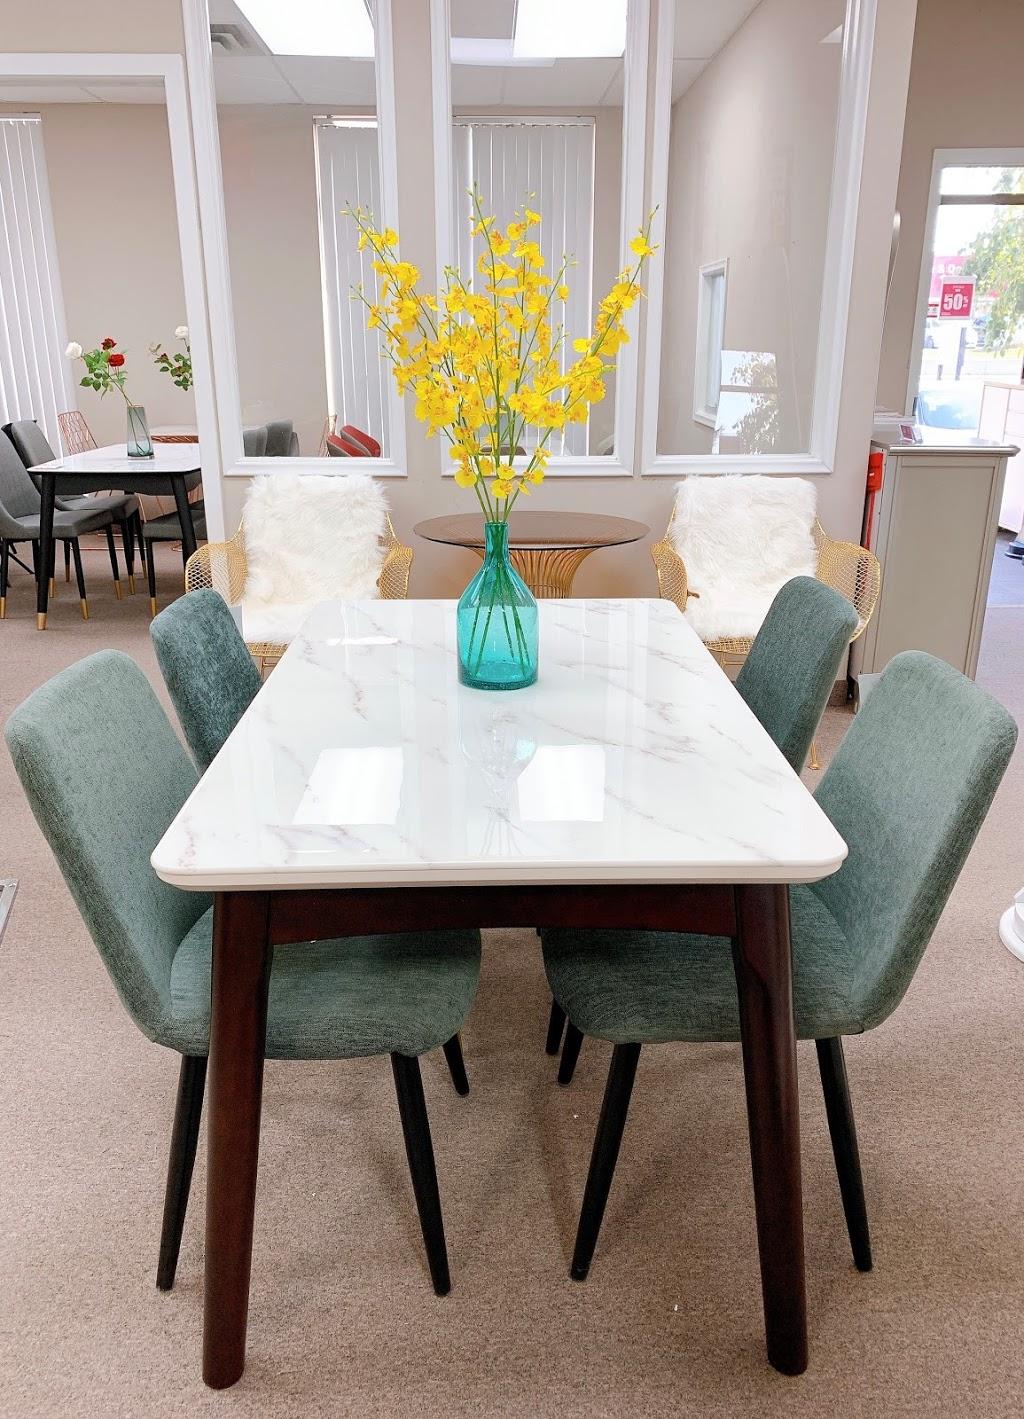 Modern Furniture Toronto / Markham 現代家私/現代家具 | furniture store | 660 Denison St, Markham, ON L3R 1C1, Canada | 6478855669 OR +1 647-885-5669